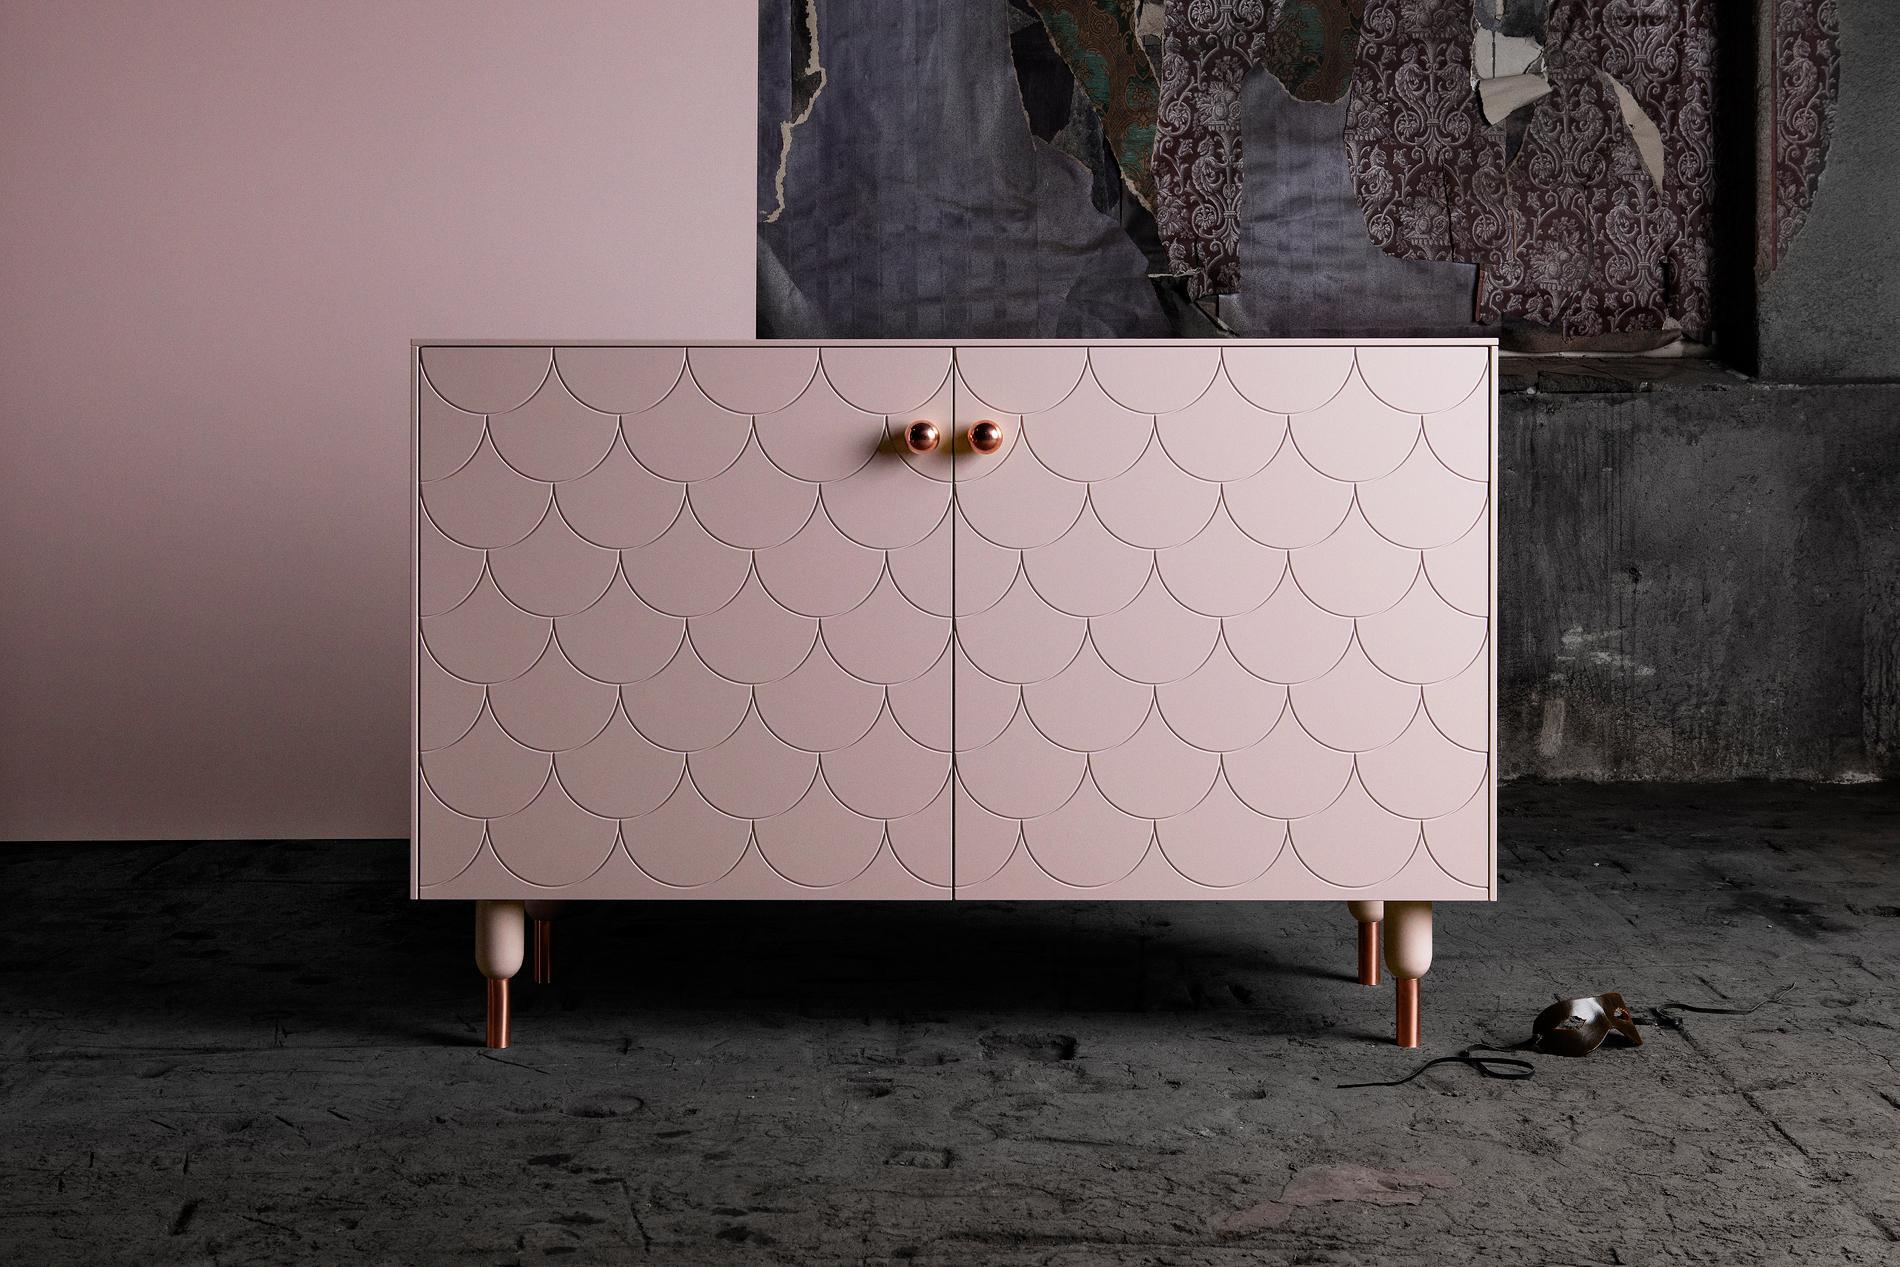 Porte Cuisine Sur Mesure Ikea dix conseils pour customiser ses meubles ikea - madame figaro